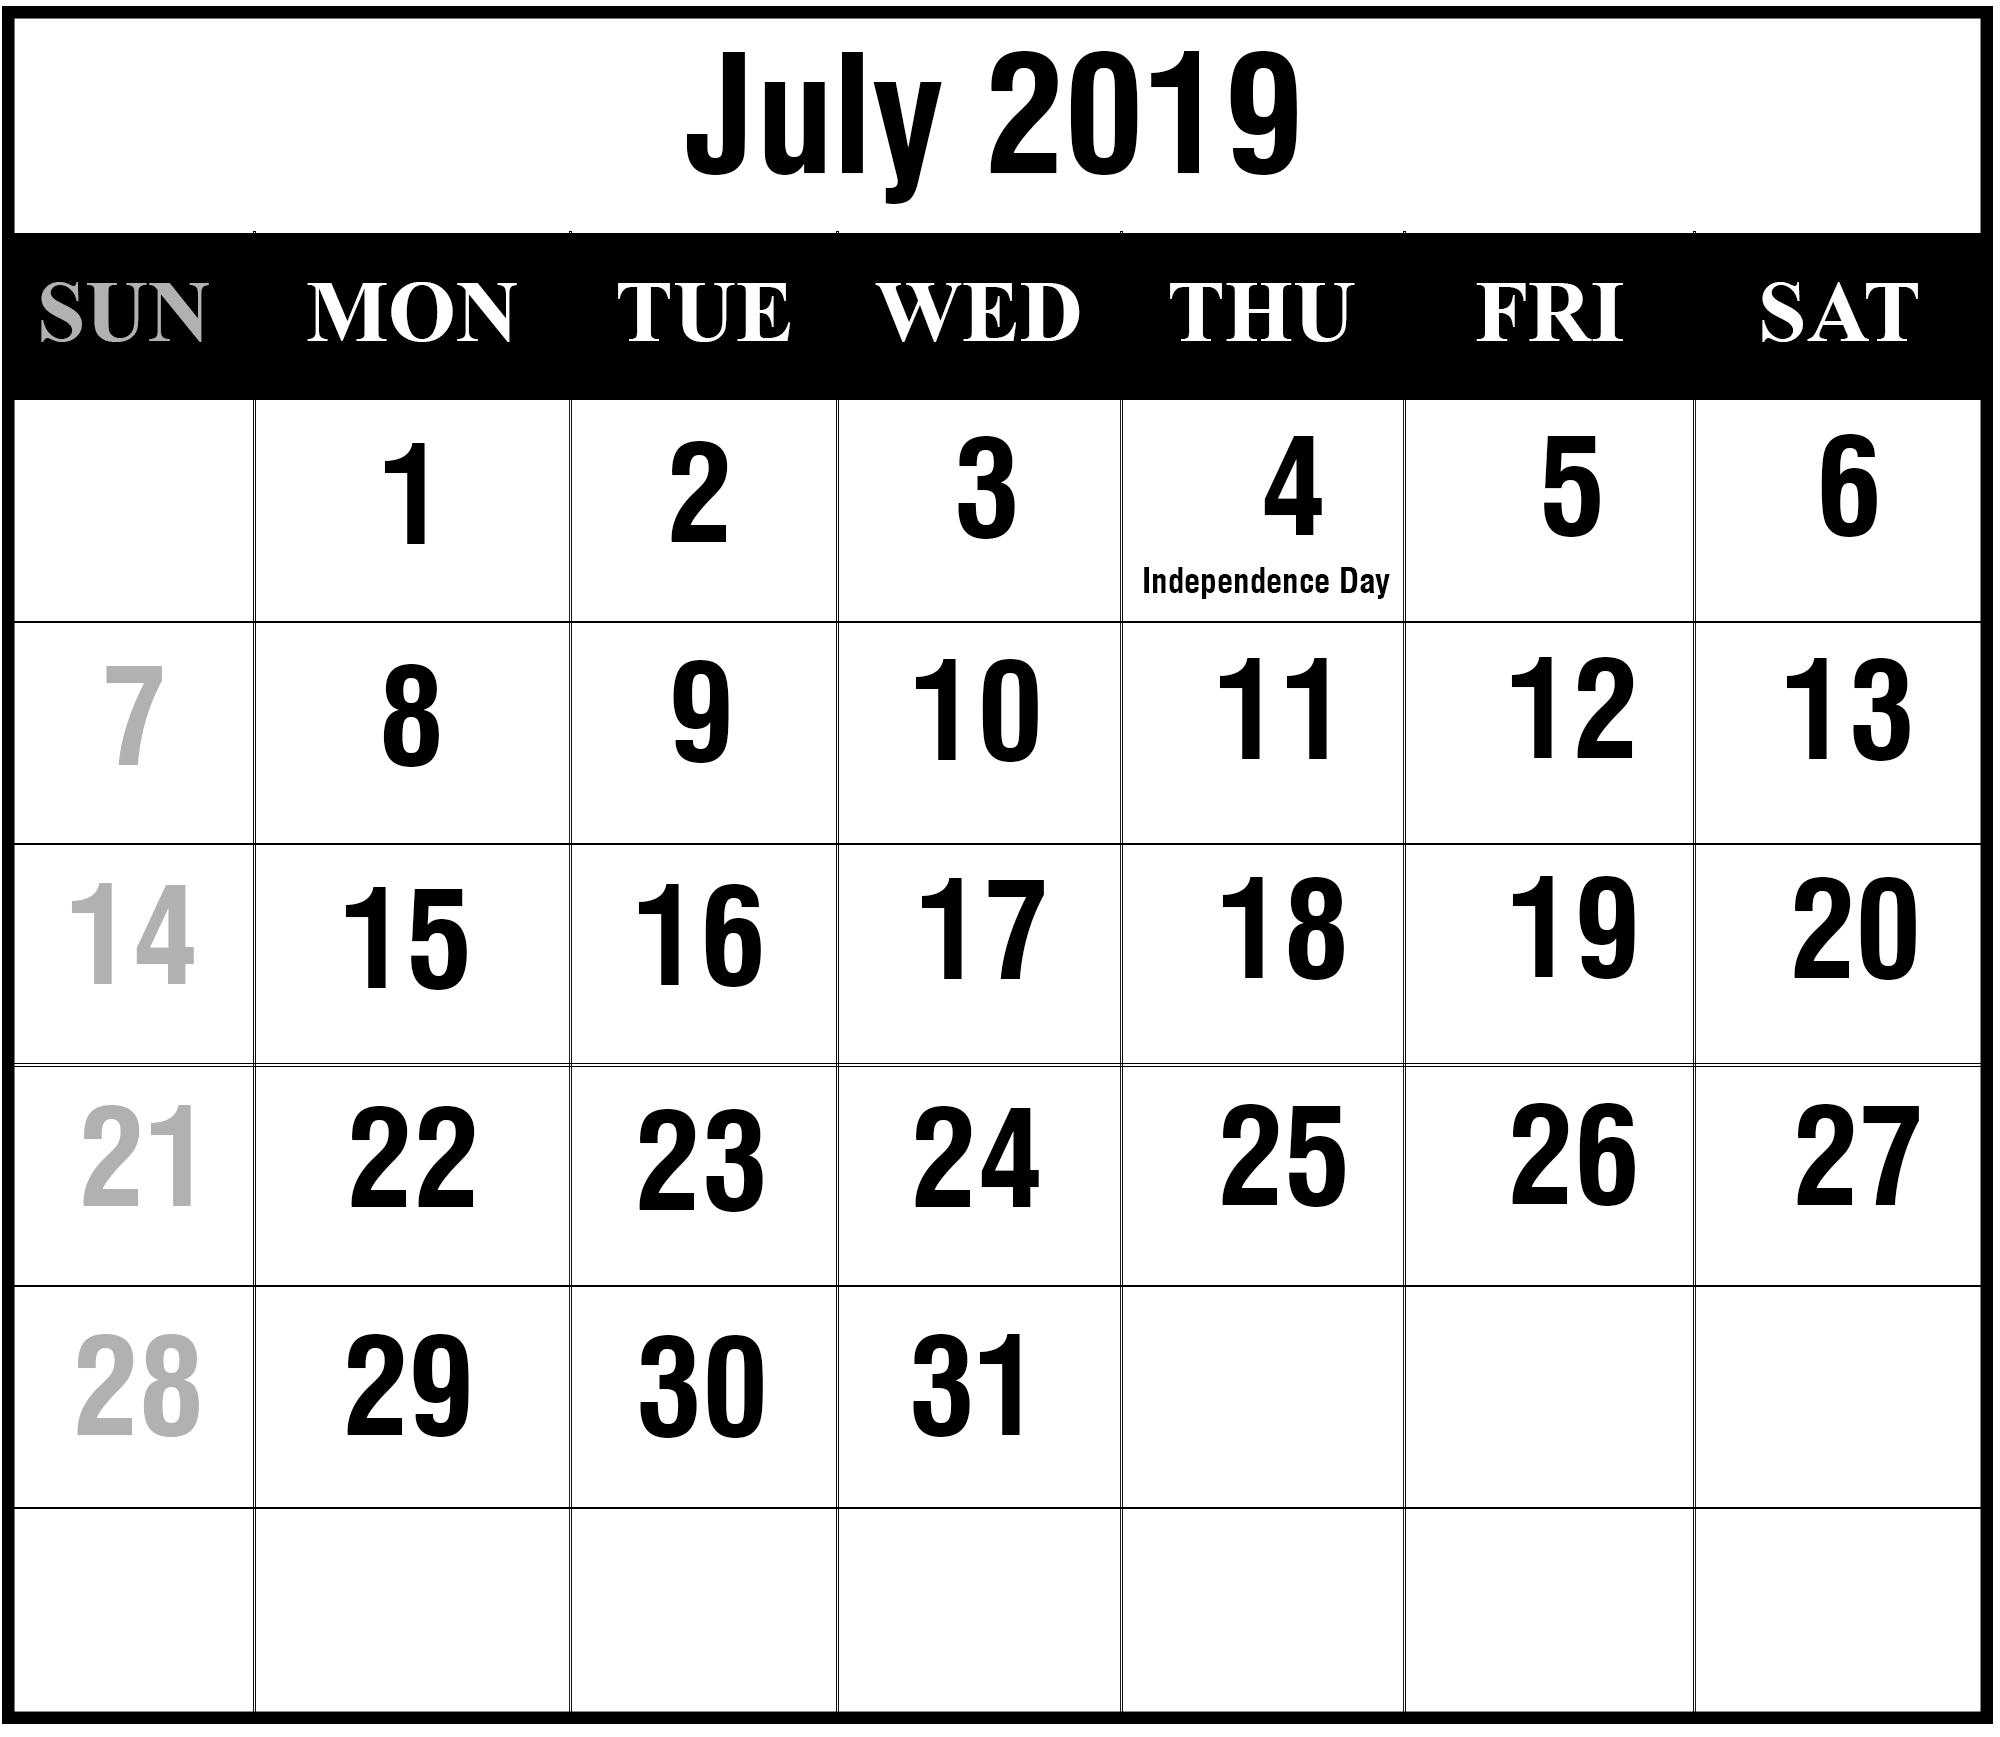 July 2019 Calendar Printable   July Blank Calendar Template July 4 2019 Calendar